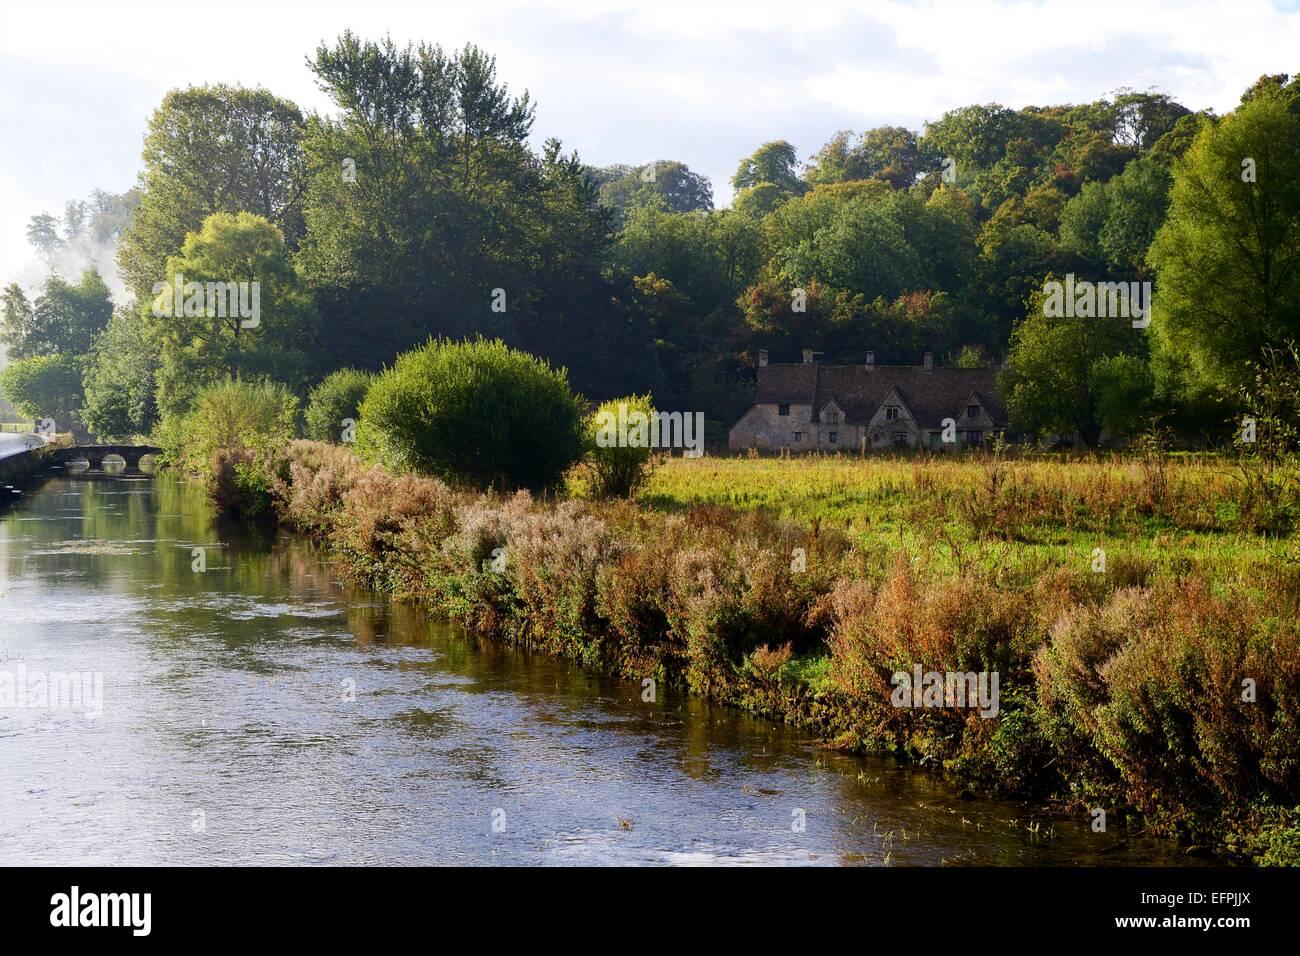 River Coln and Arlington Row, Bibury, Cotswolds, Gloucestershire, England, United Kingdom, Europe - Stock Image